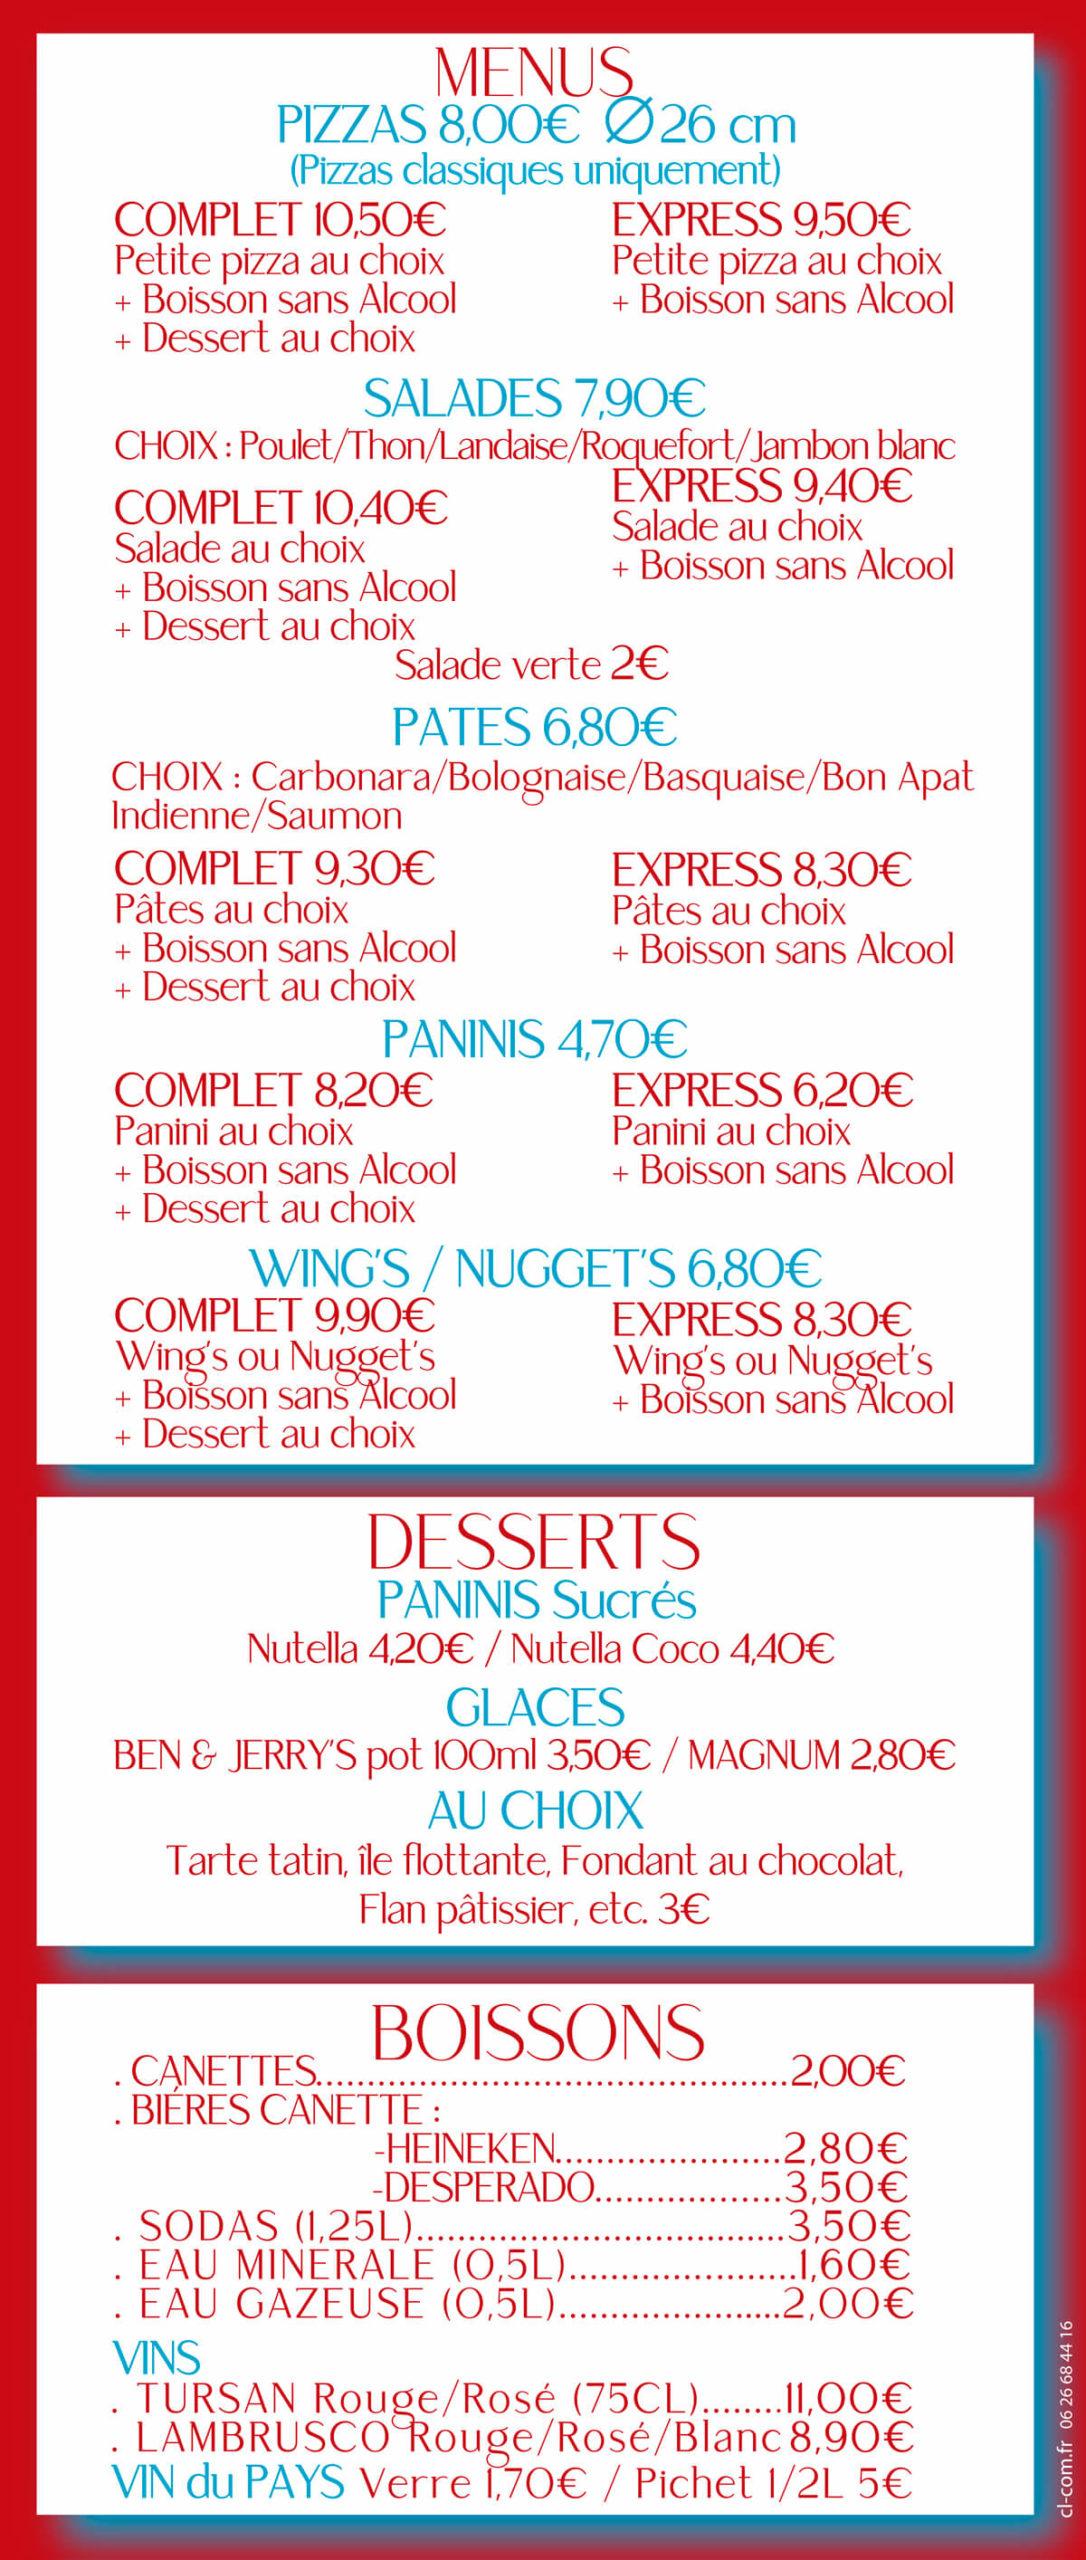 Menus / Desserts / Boissons